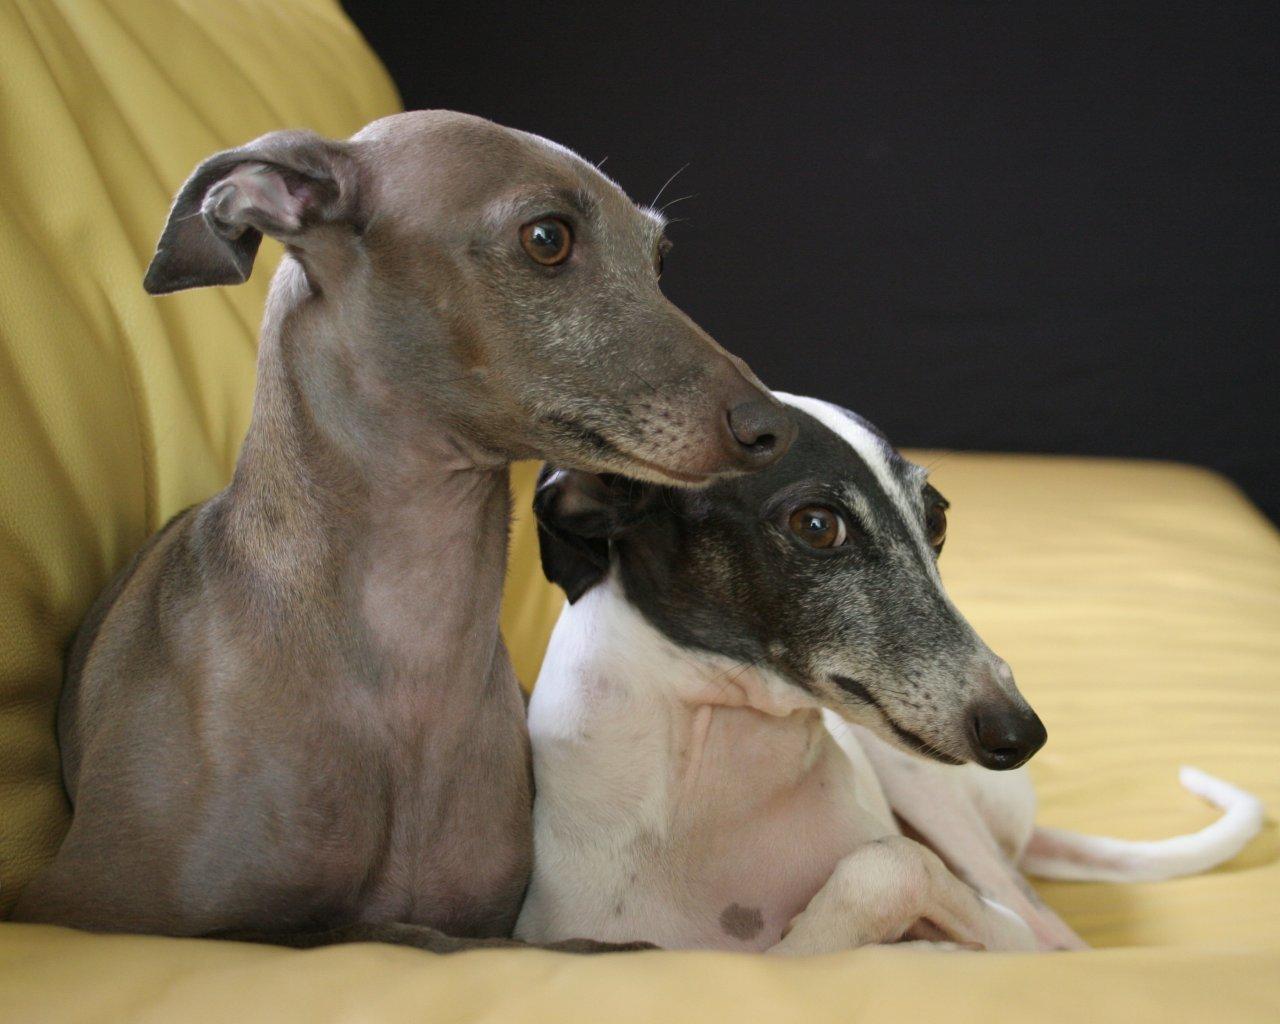 http://images2.fanpop.com/image/photos/13000000/Italian-Greyhound-dogs-13073855-1280-1024.jpg